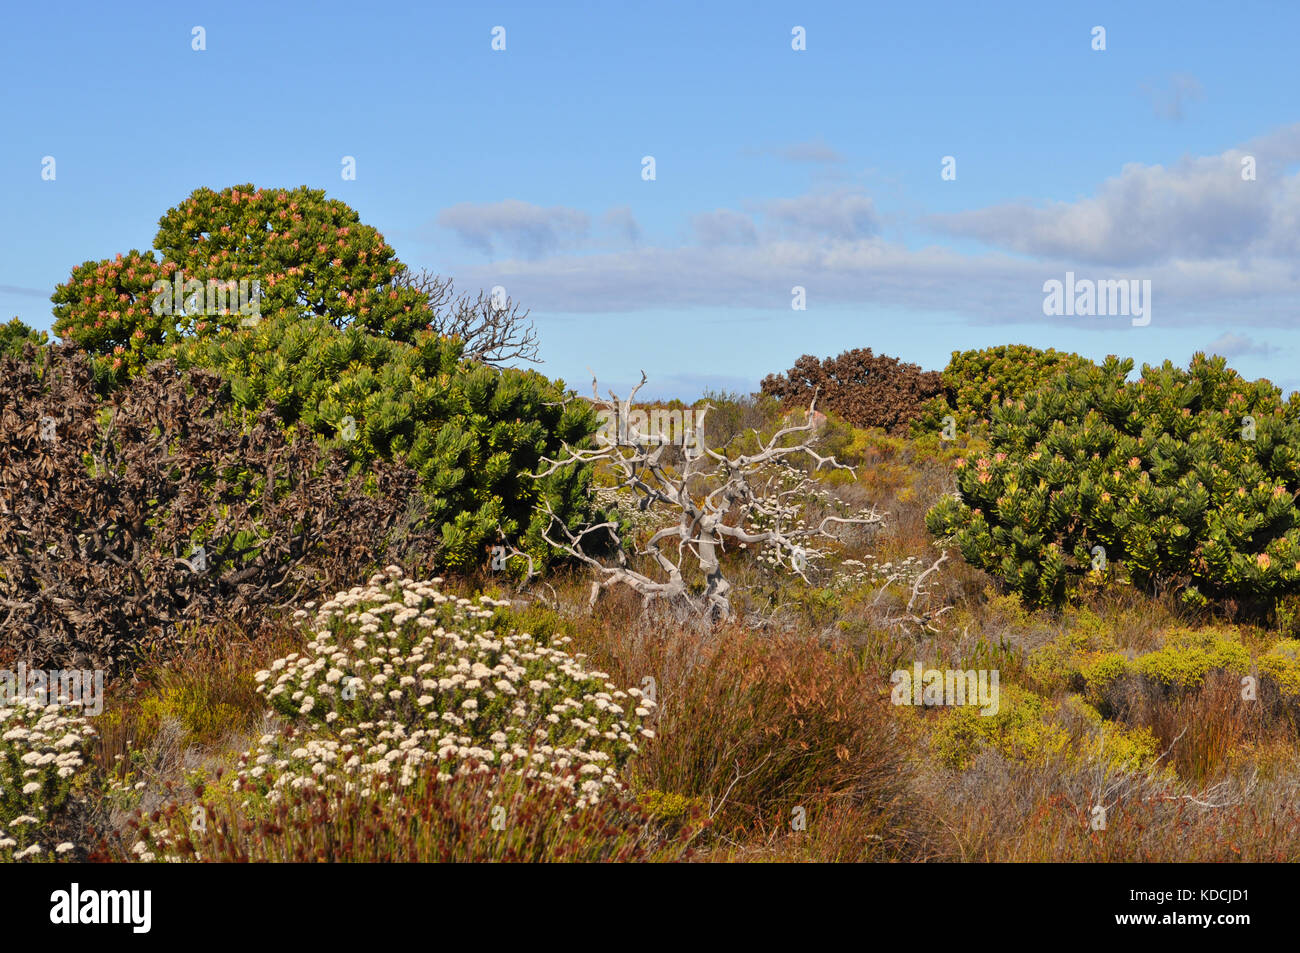 Fynbos Vegetation on the Cape Peninsula, near Cape Town, South Africa Stock Photo